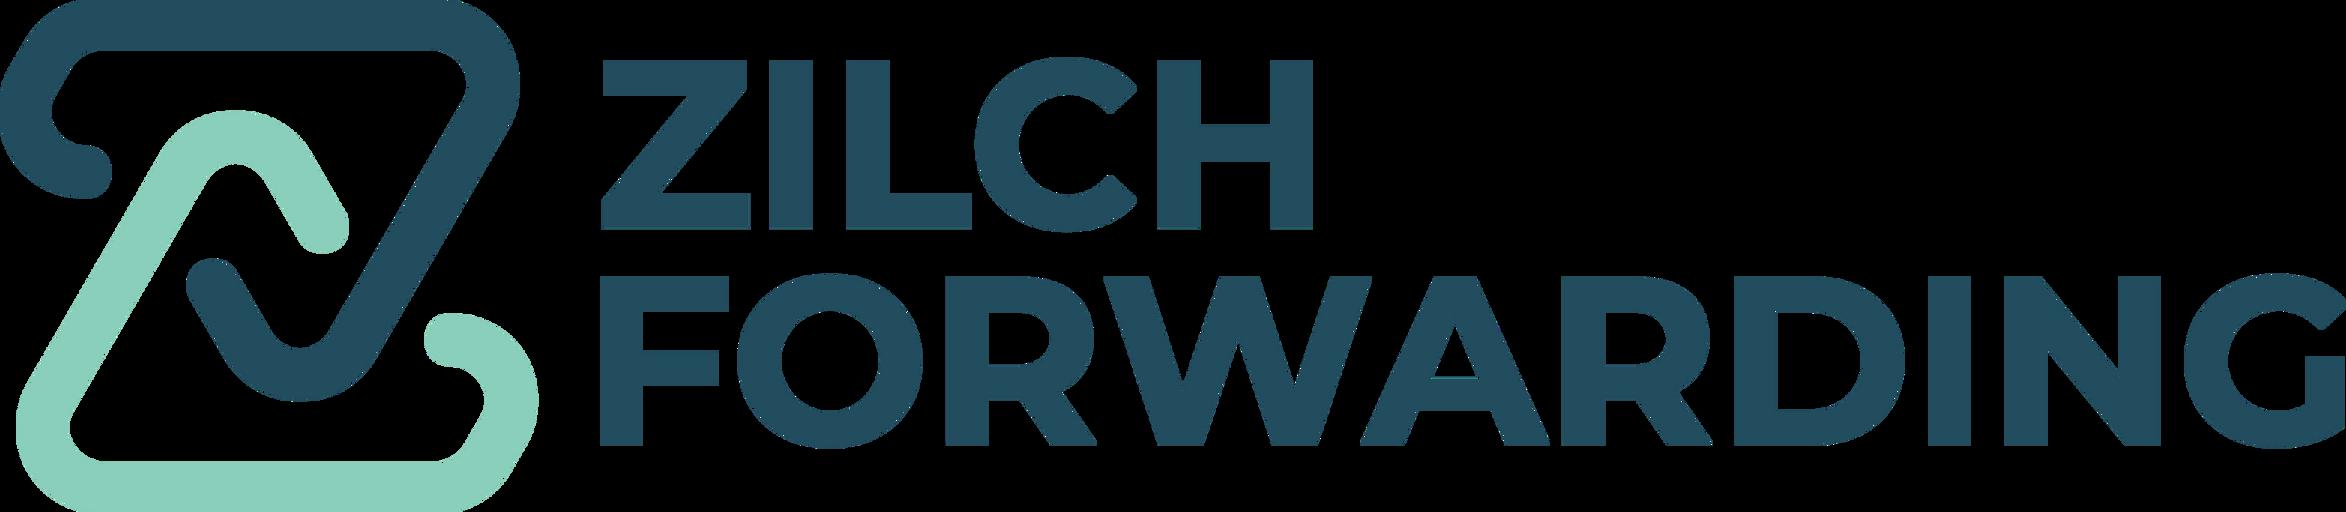 Zilch Forwarding - Web Development - Joshua Harris